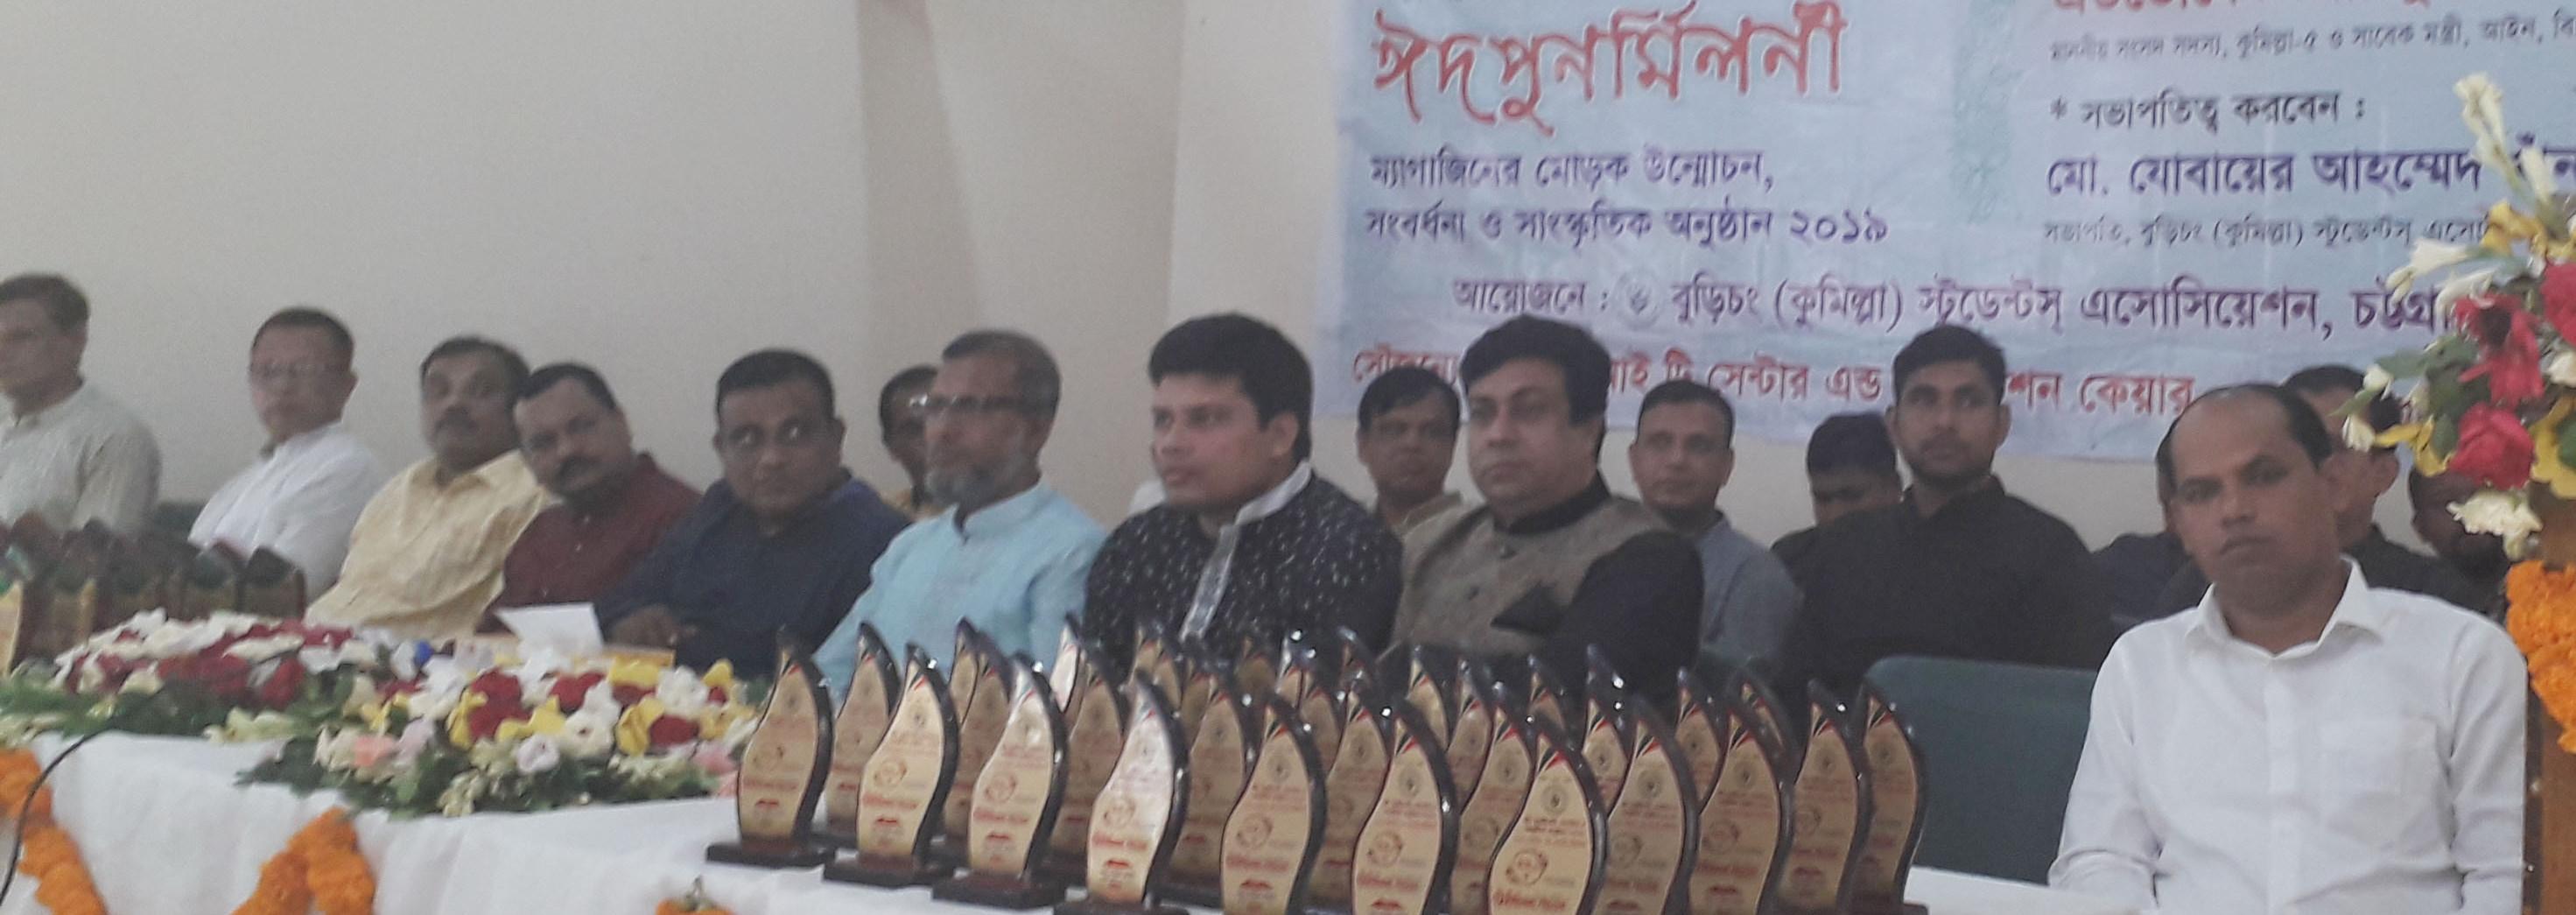 Eid reunion of Chittagong University Student Association of Burichong